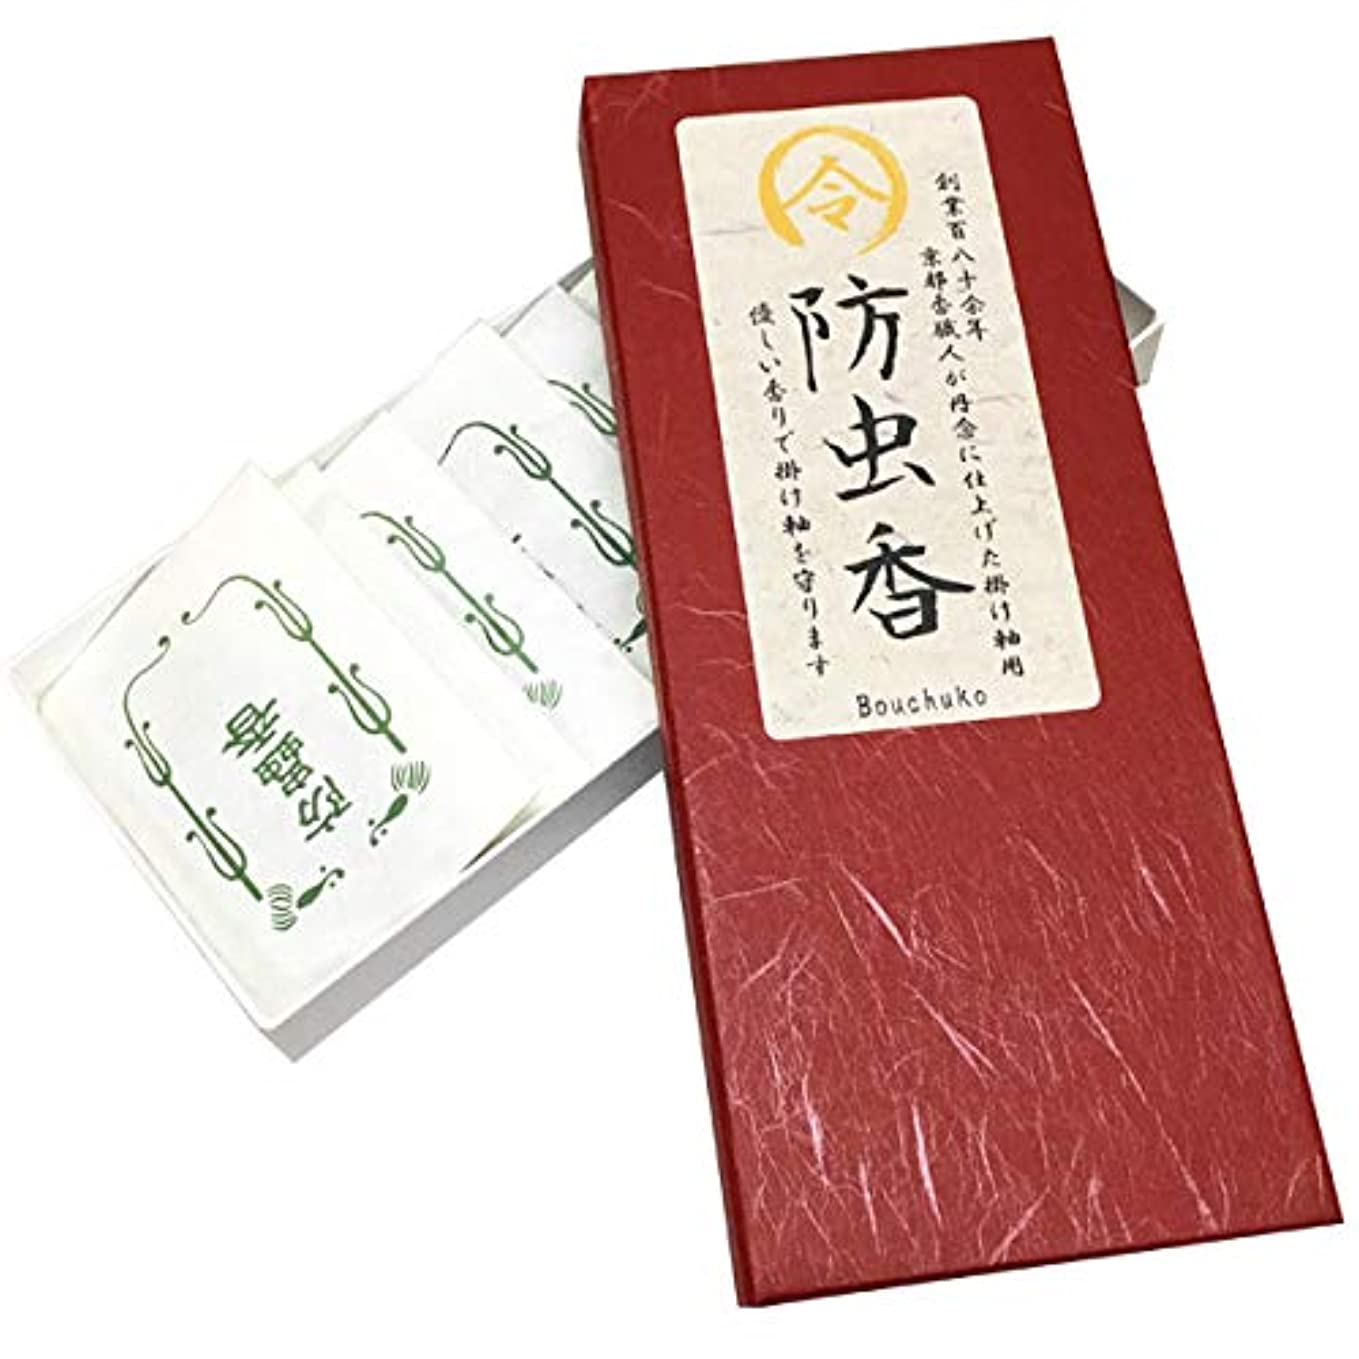 効率的に通路主張掛け軸用 表具用 高級香 令和印の掛軸防虫香(白檀香) 1箱10袋入り